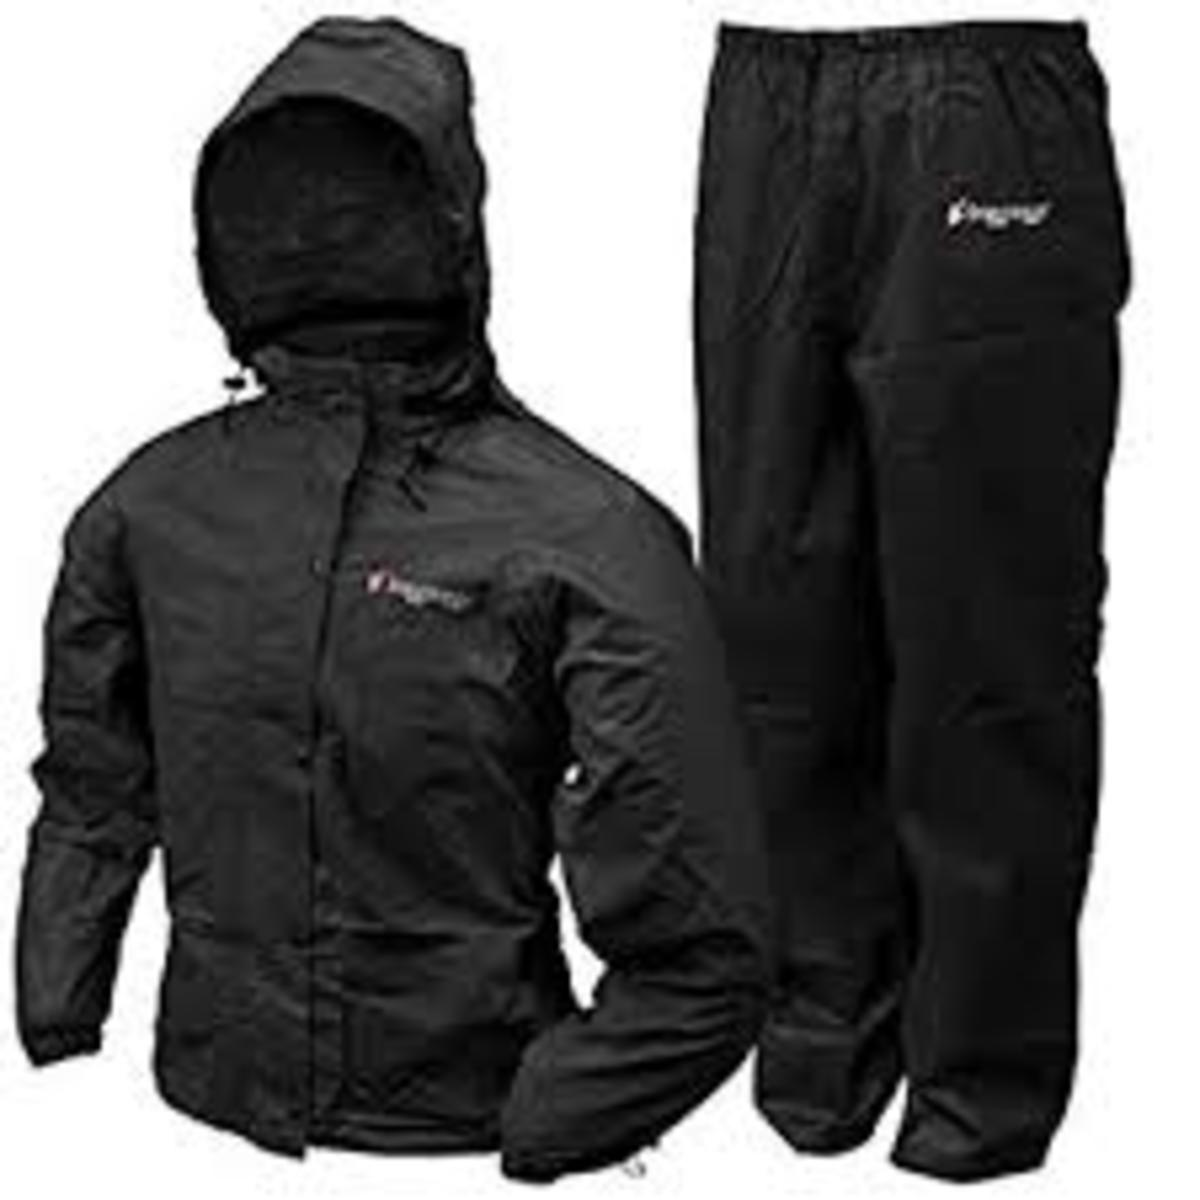 Frogg Toggs All Sport Rain Suit - Black